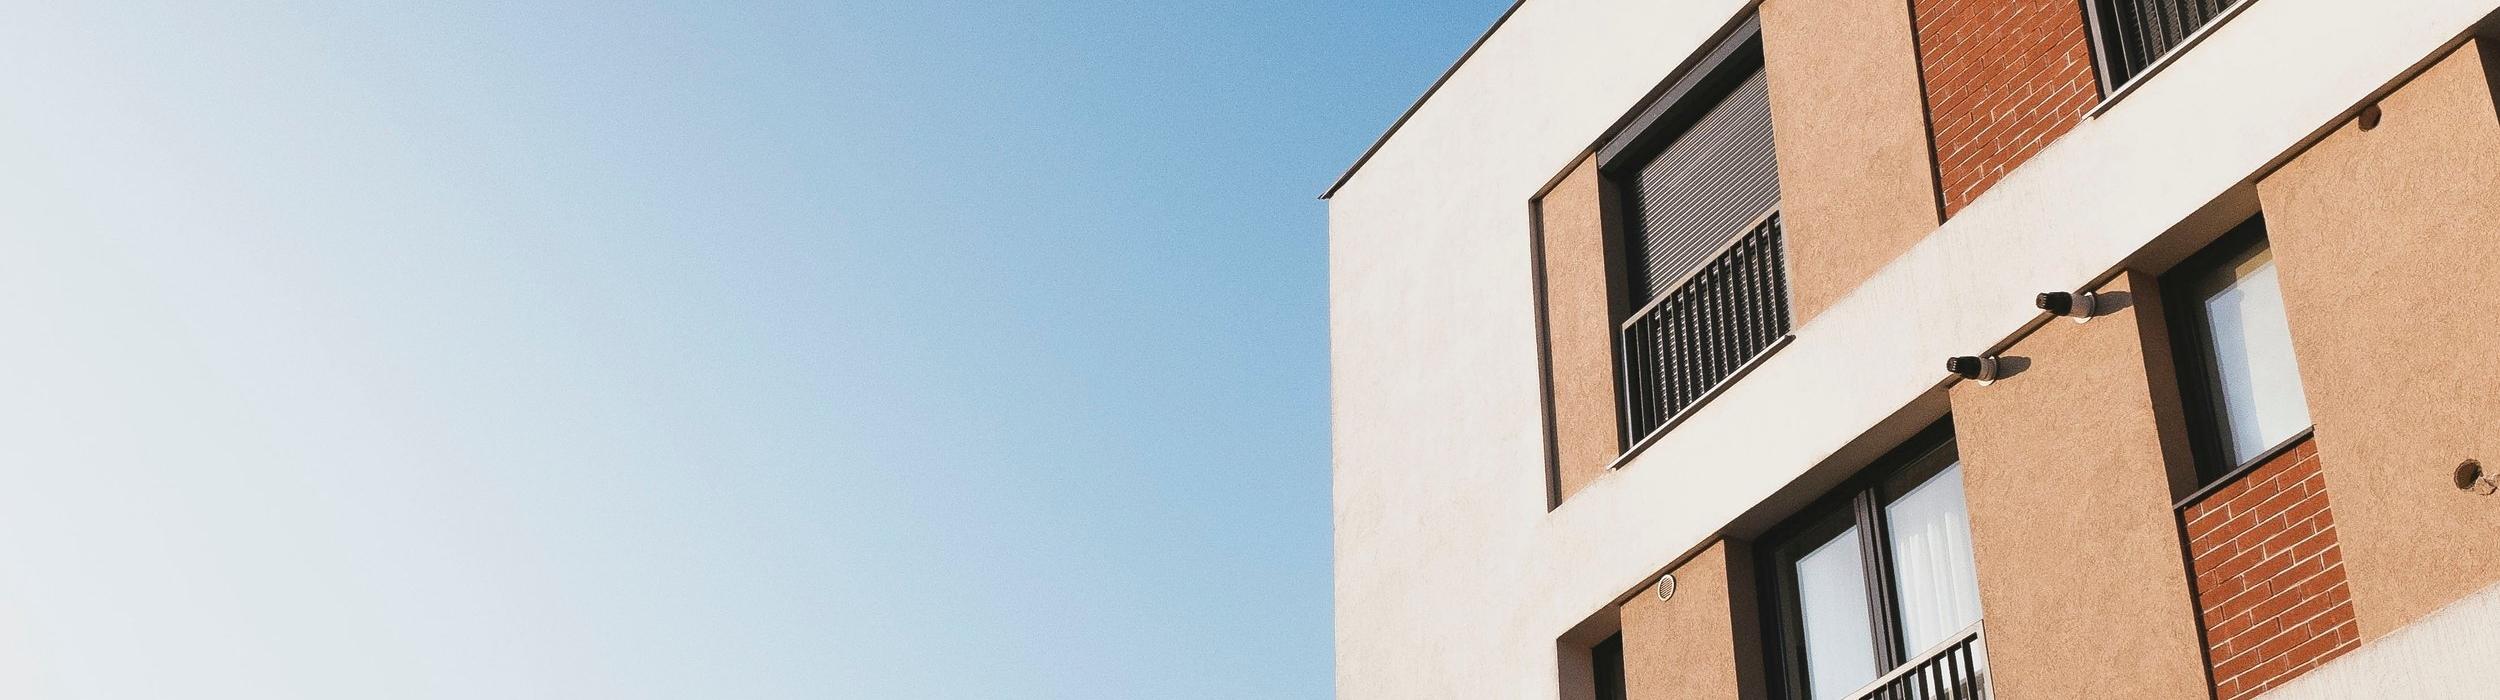 Landlord|Tenant -